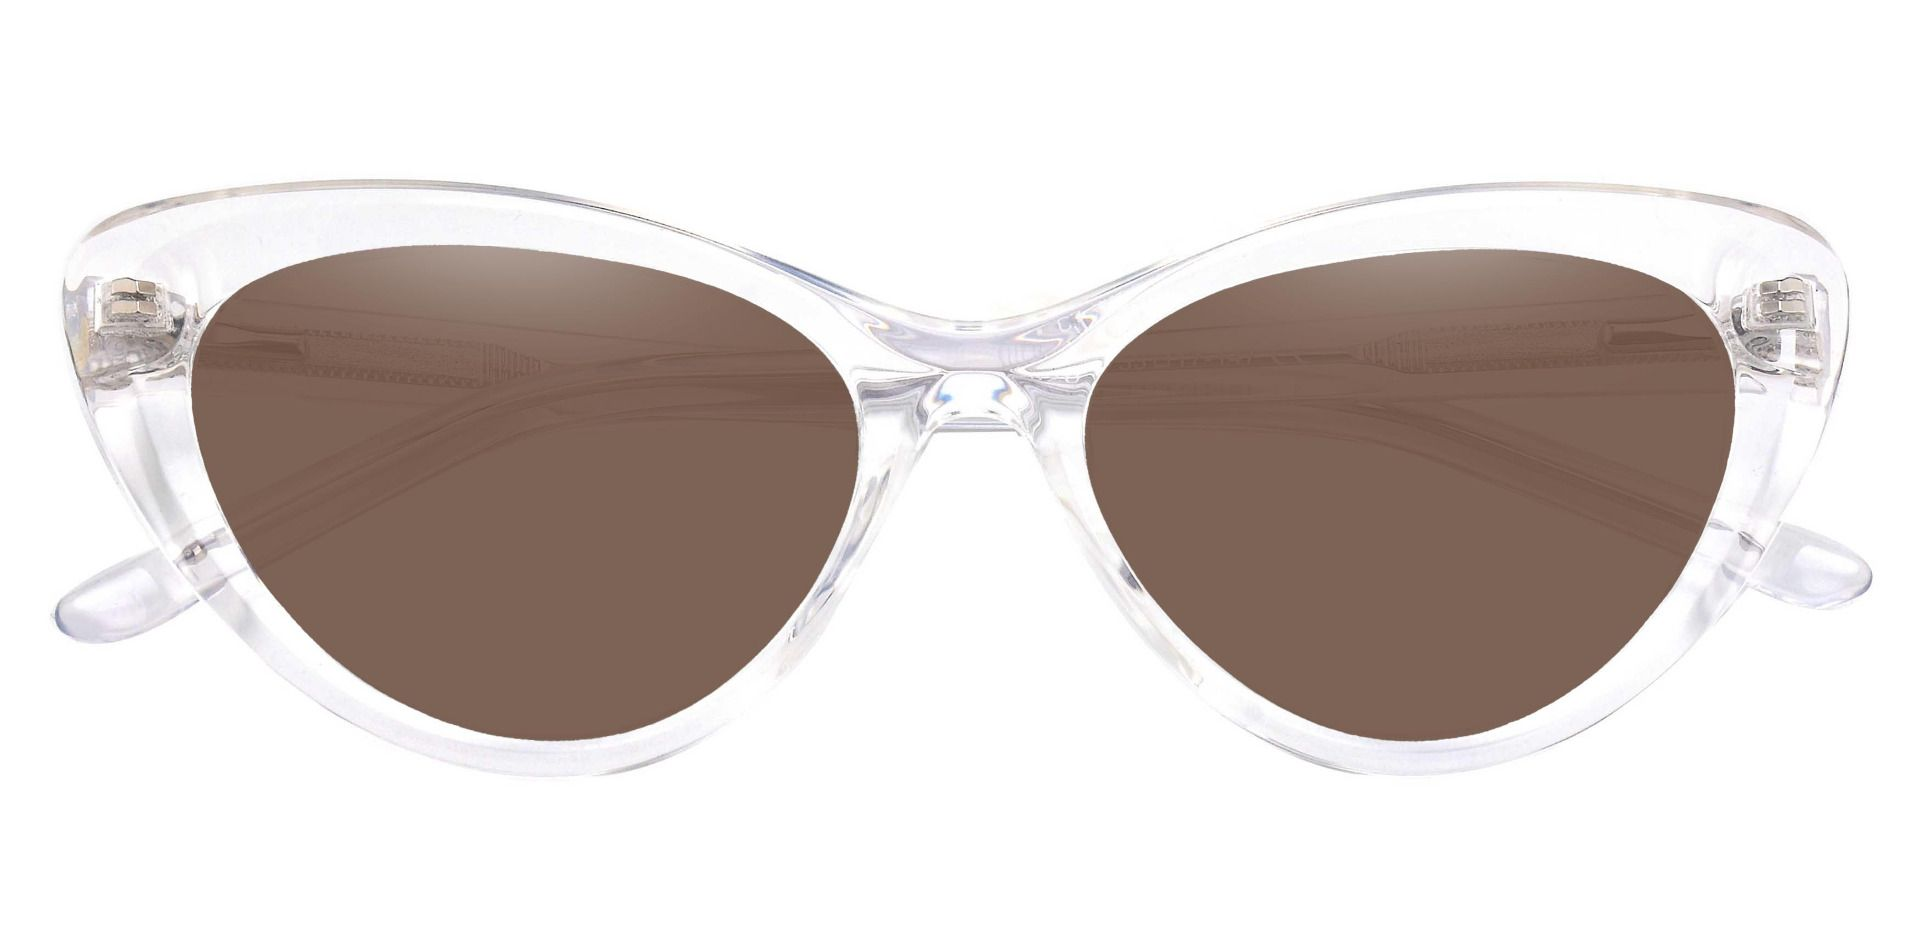 Gemini Cat Eye Prescription Sunglasses - Clear Frame With Brown Lenses